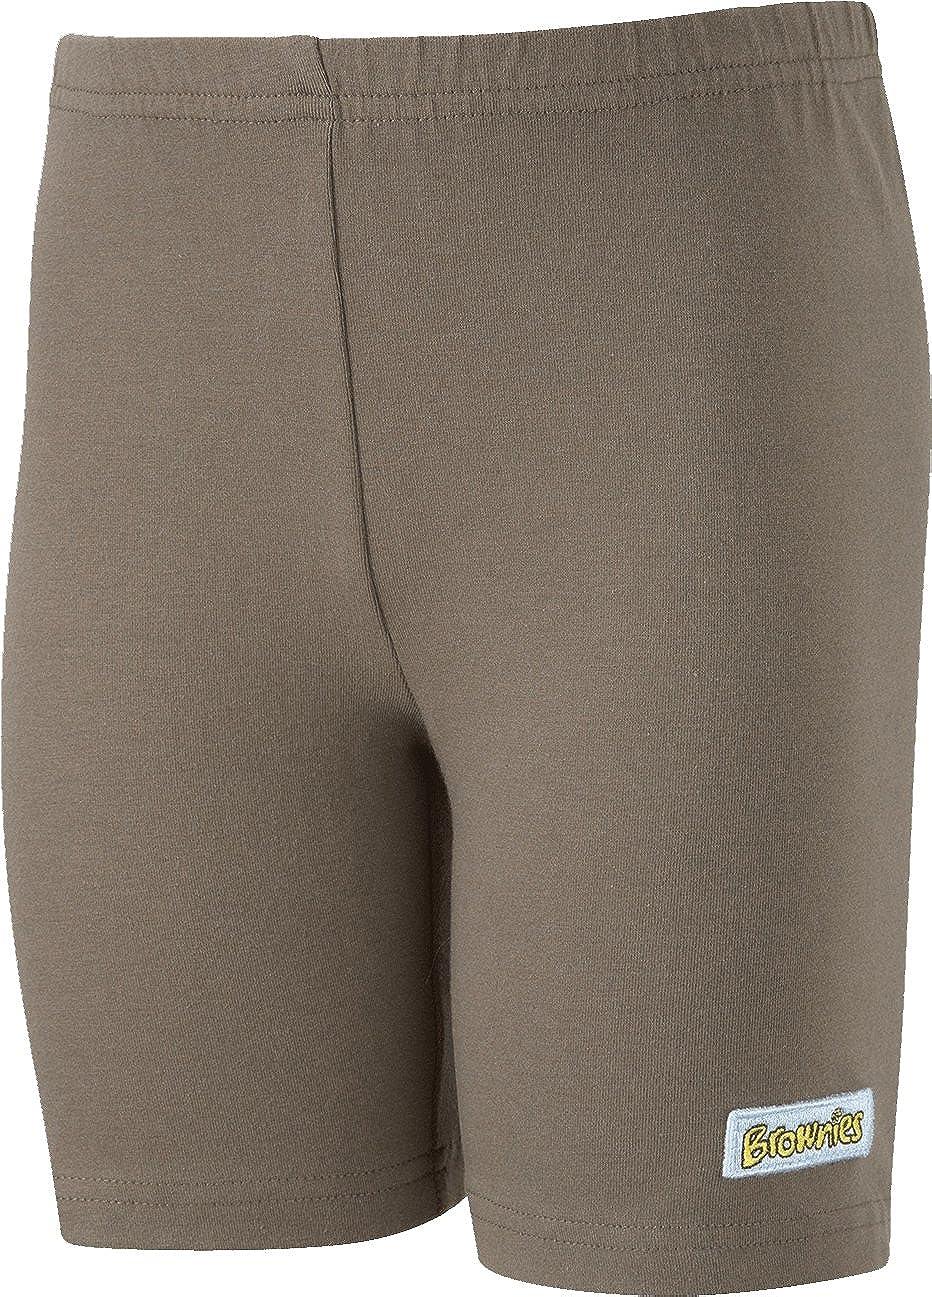 Mens PJ Lounge Pant Jersey Or Jacquard Elasticated Waist Cargo Bay /& Jason Jones